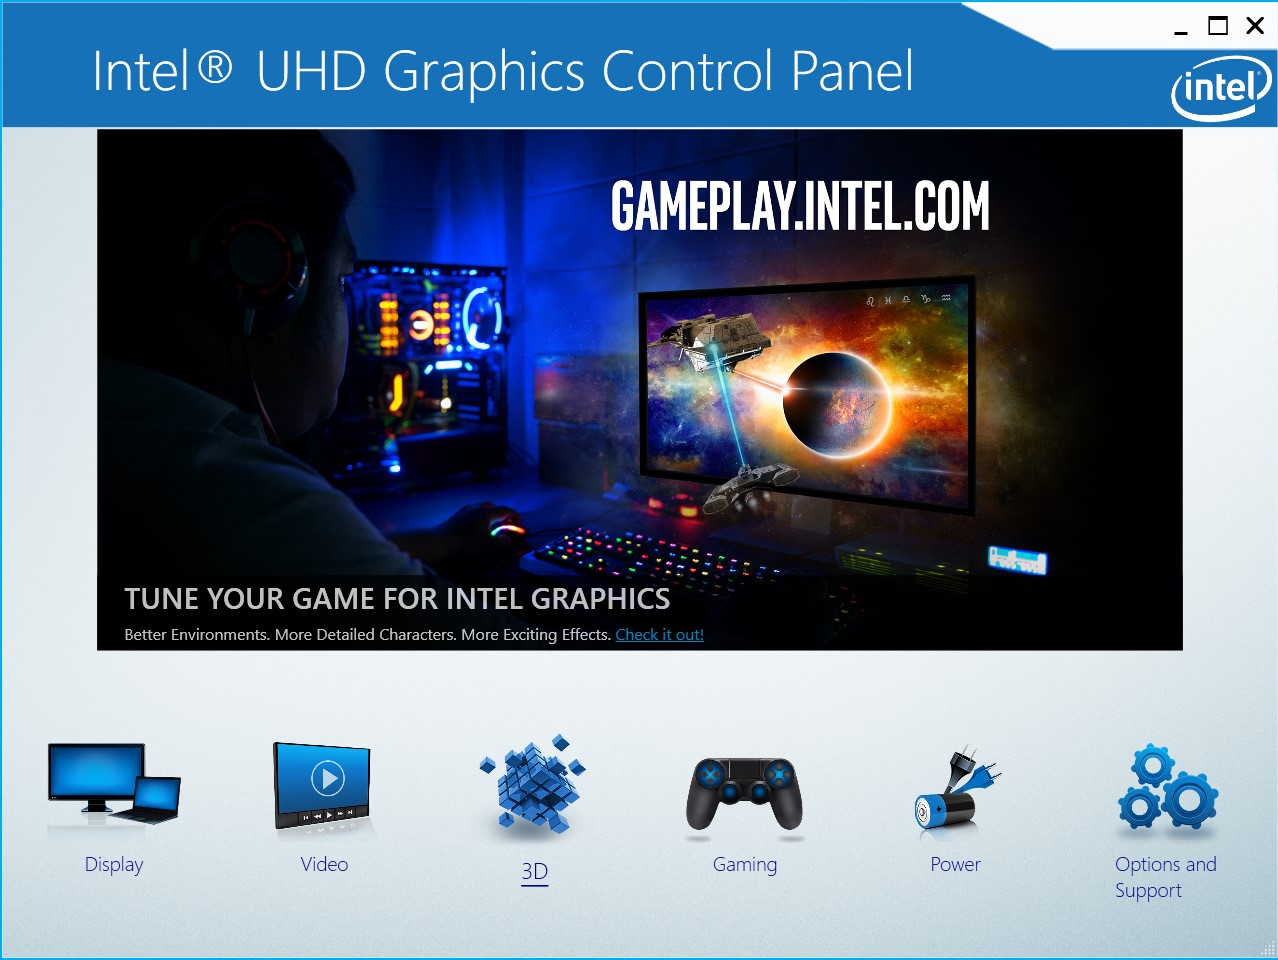 The Intel UHD Graphics Control Panel main menu